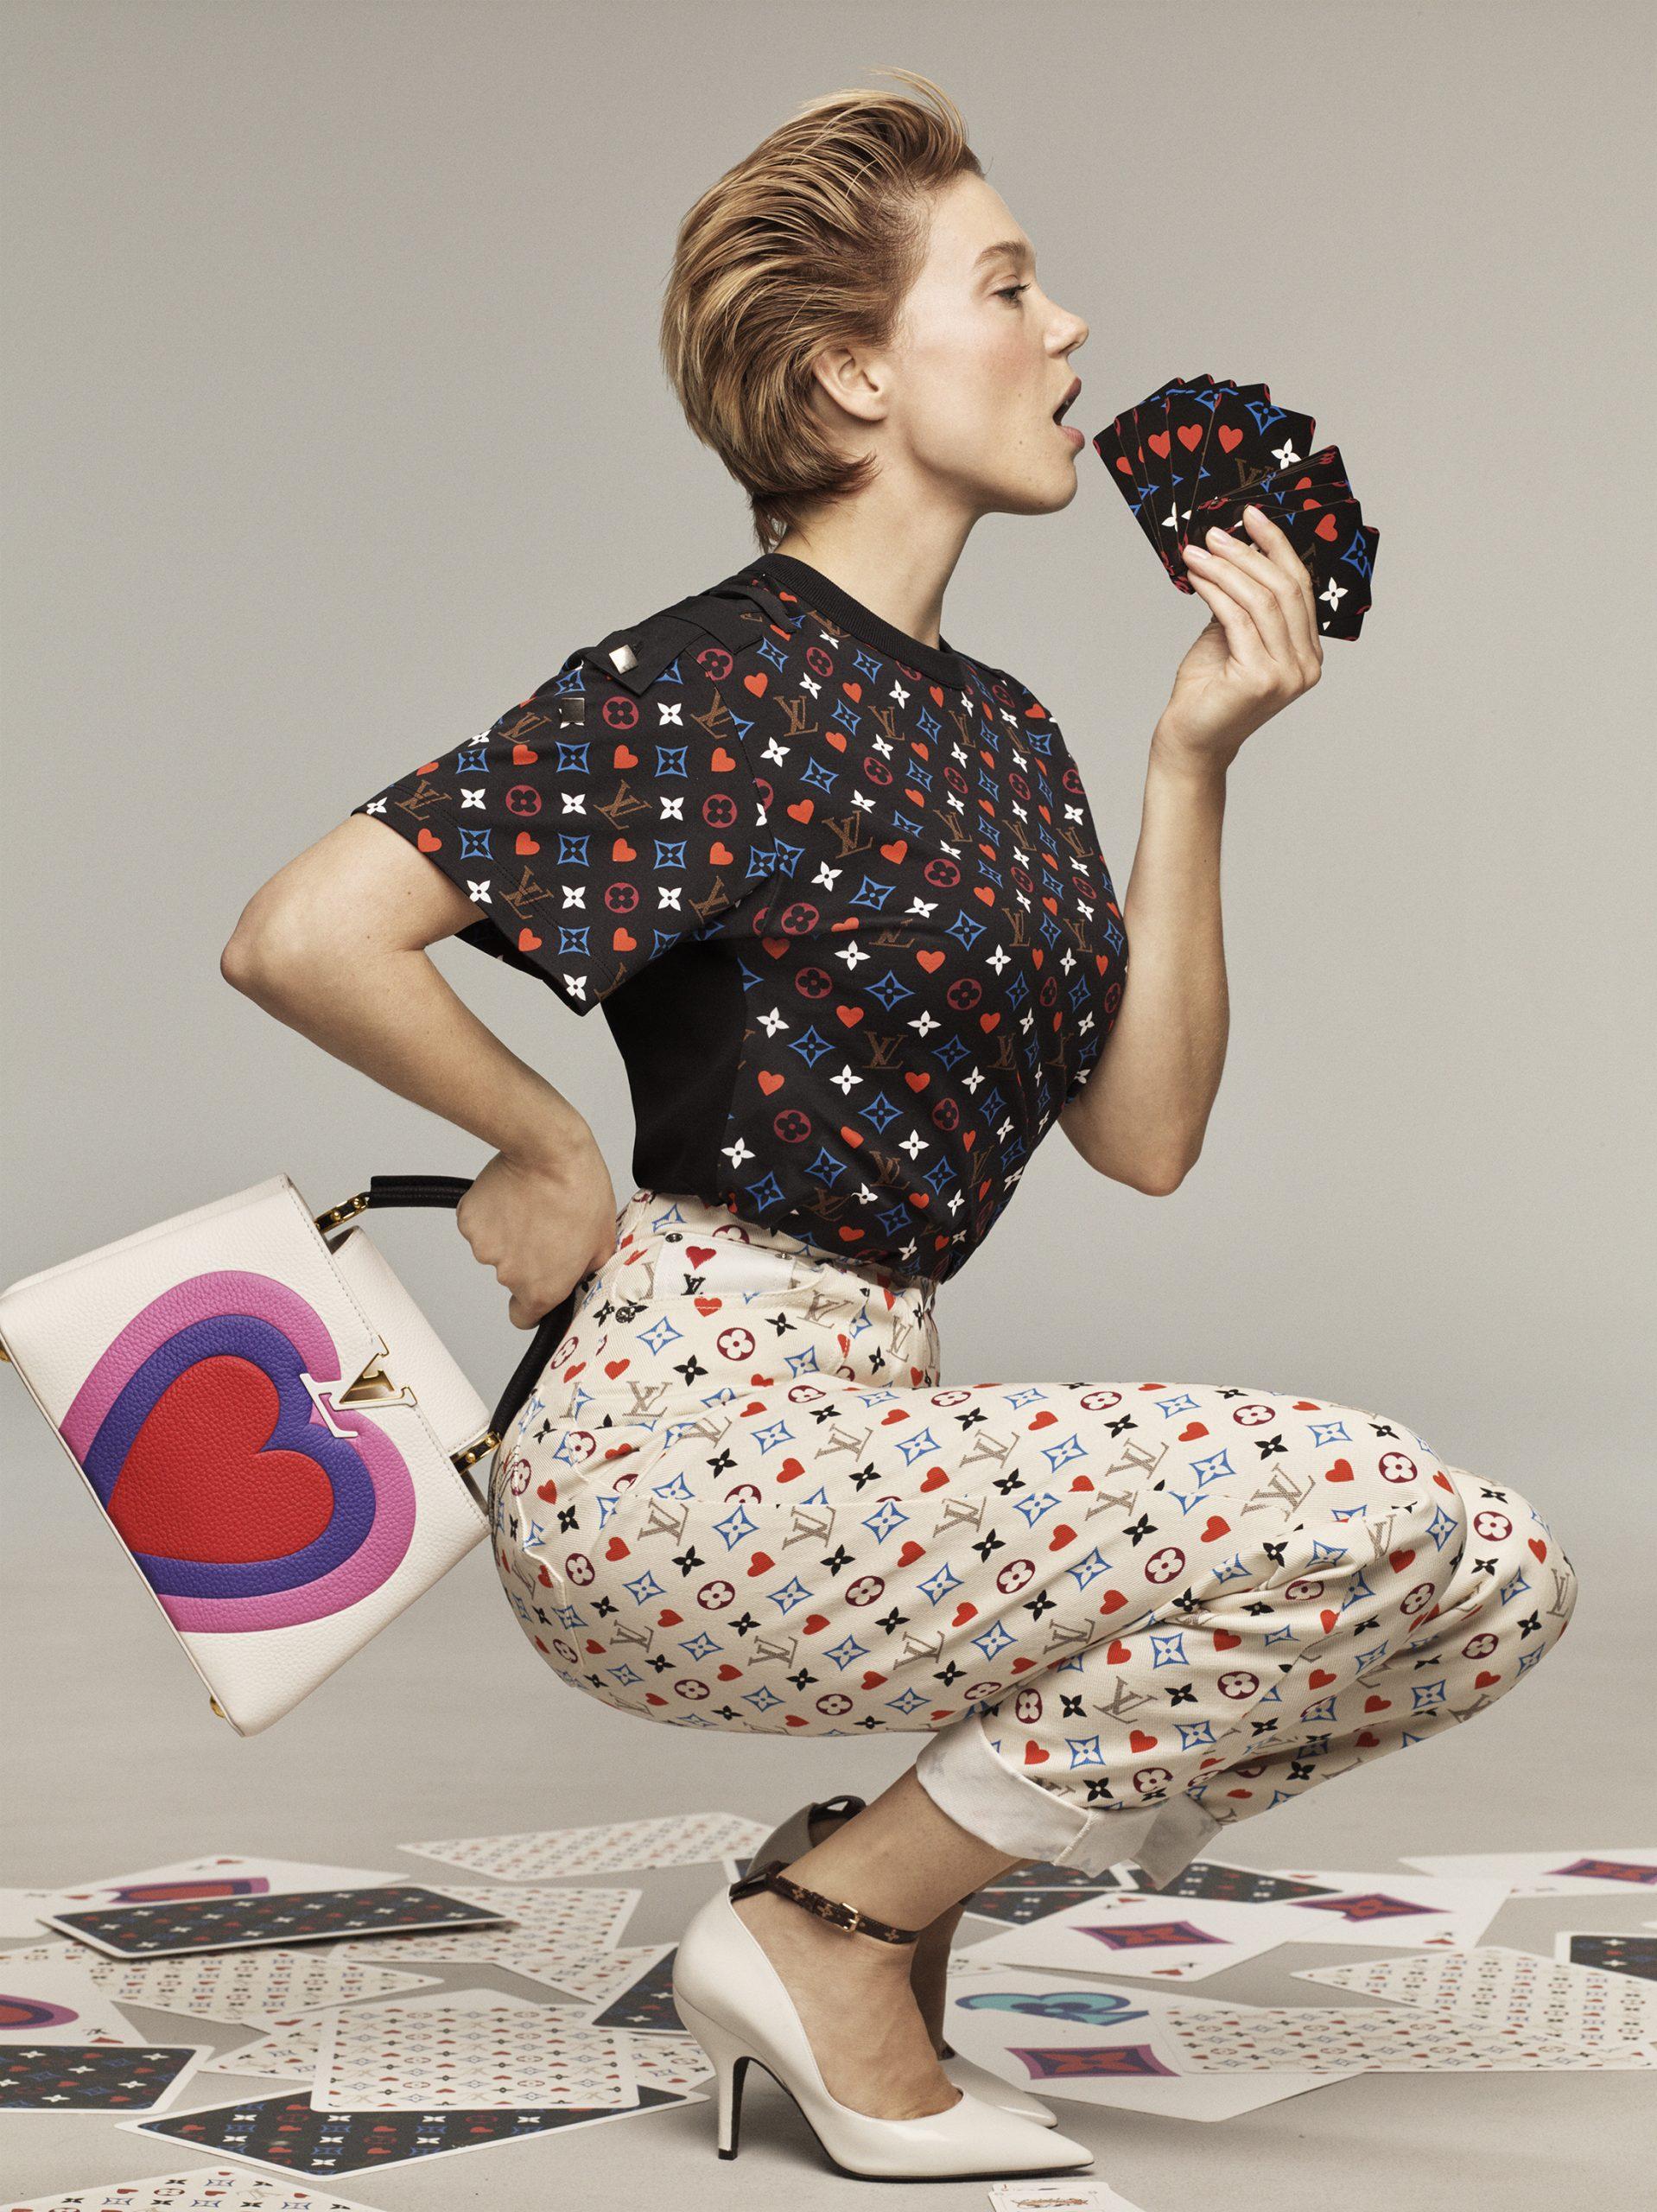 Louis Vuitton Resort 2021 Ad Campaign Photos